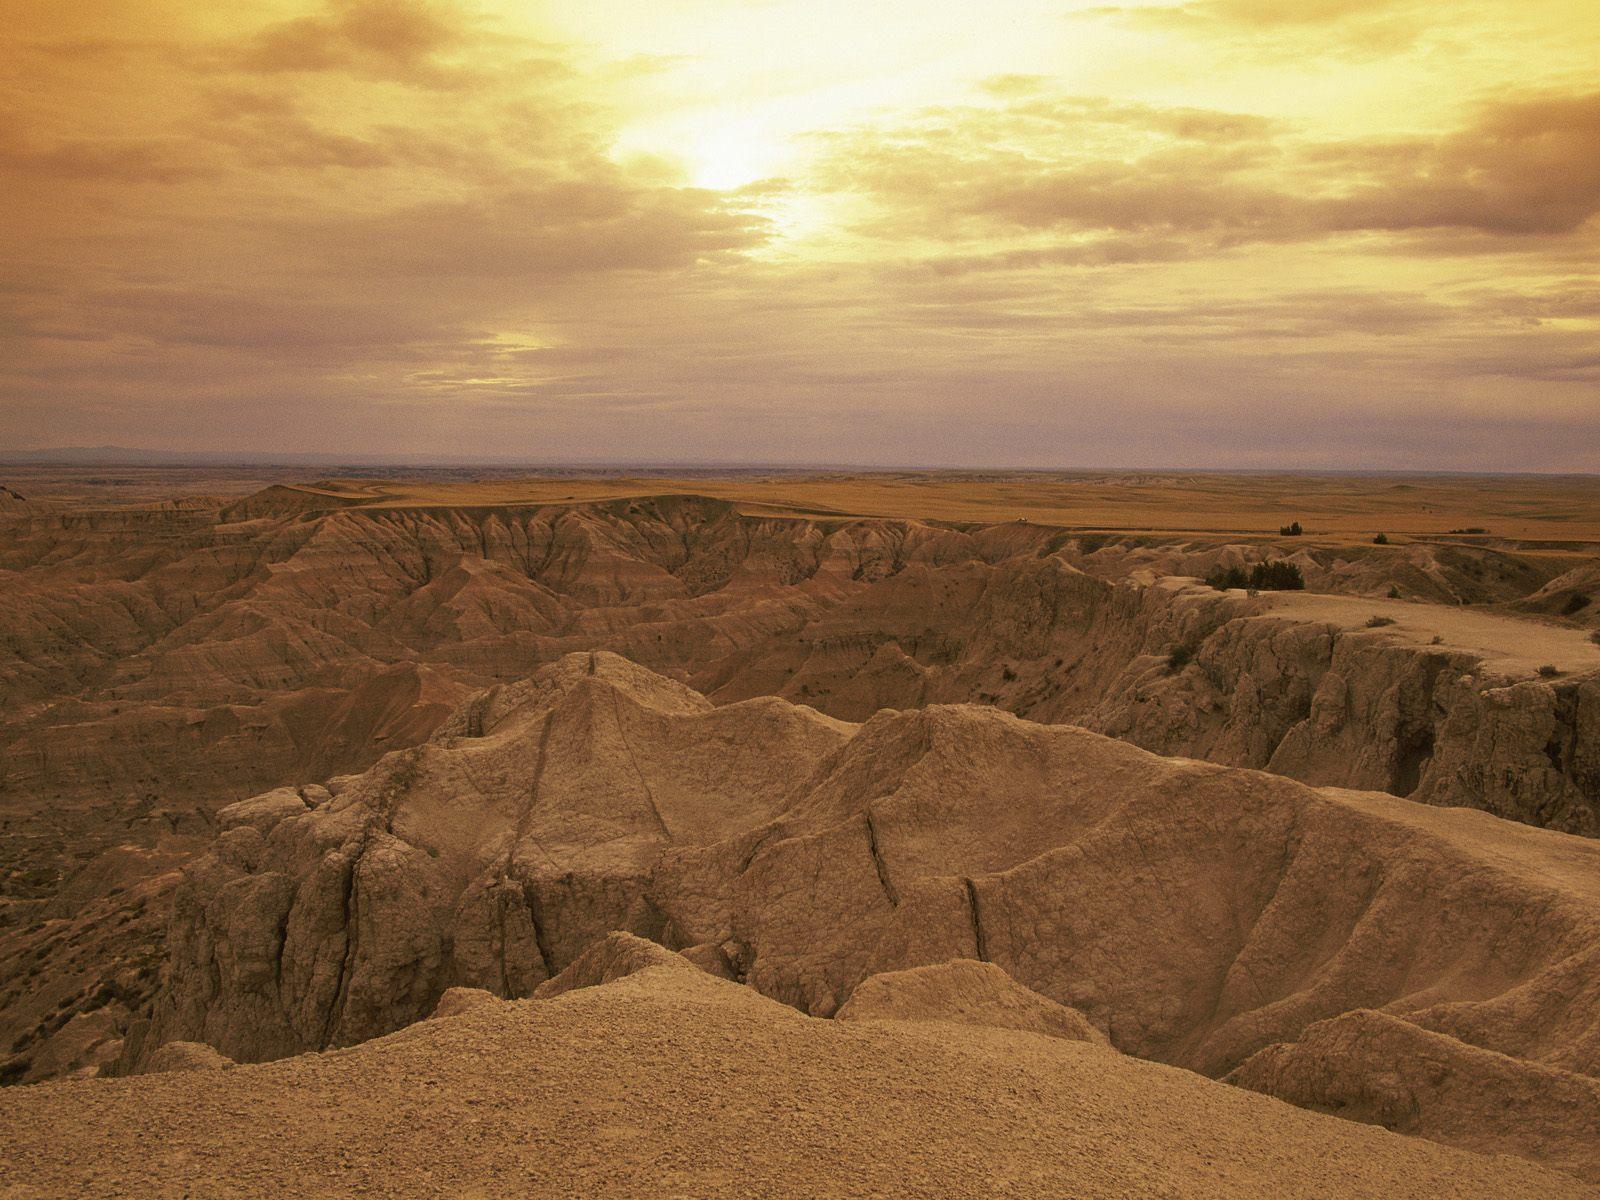 Pinnacles Overlook Badlands National Park South Dakota.jpg